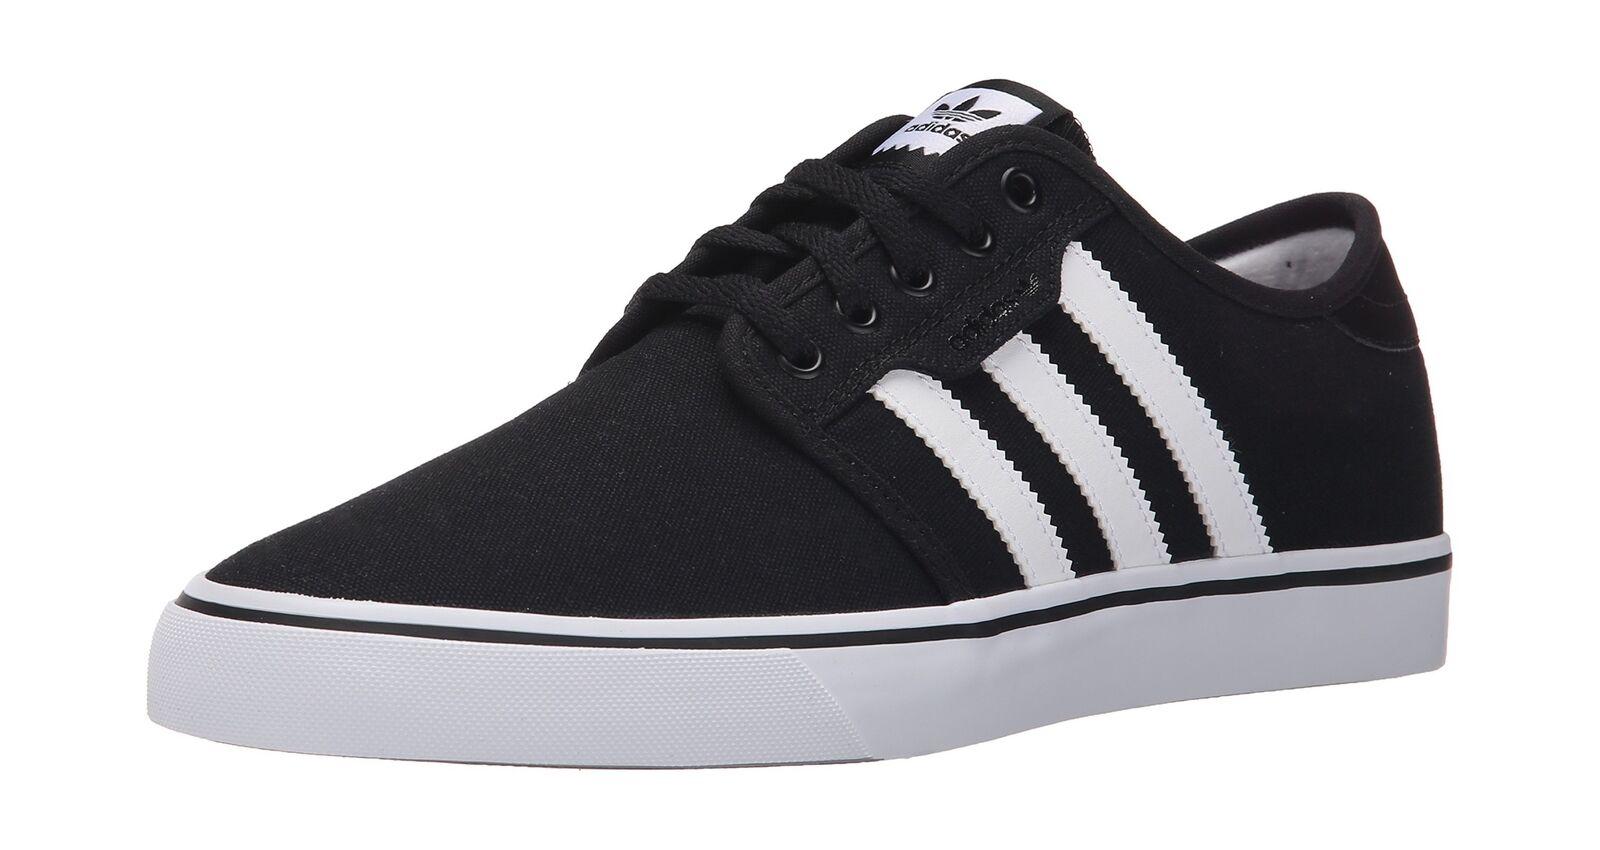 adidas Men's Seeley D(M) Skate Shoe Black/White/Gum 10 D(M) Seeley US 4f7dd2